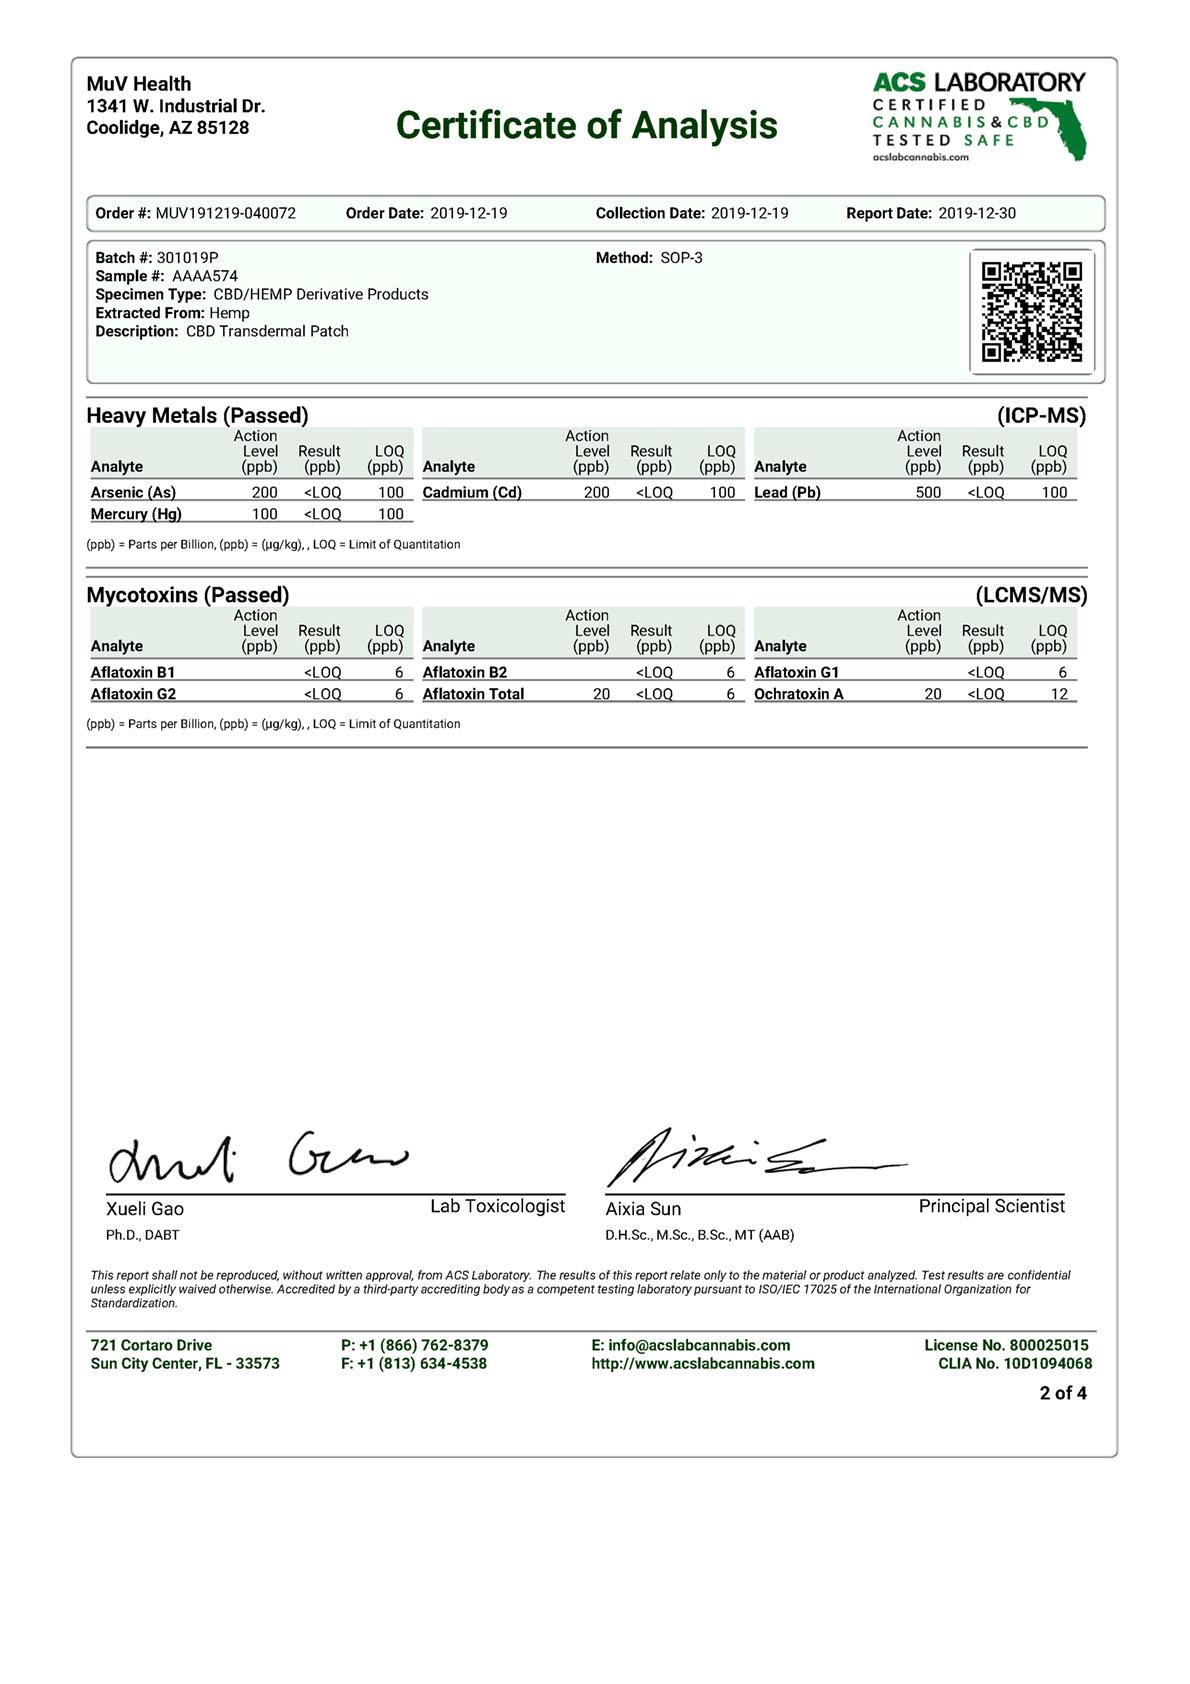 muv-cbd-transdermal-patch-coa-301019p-page-2.jpg